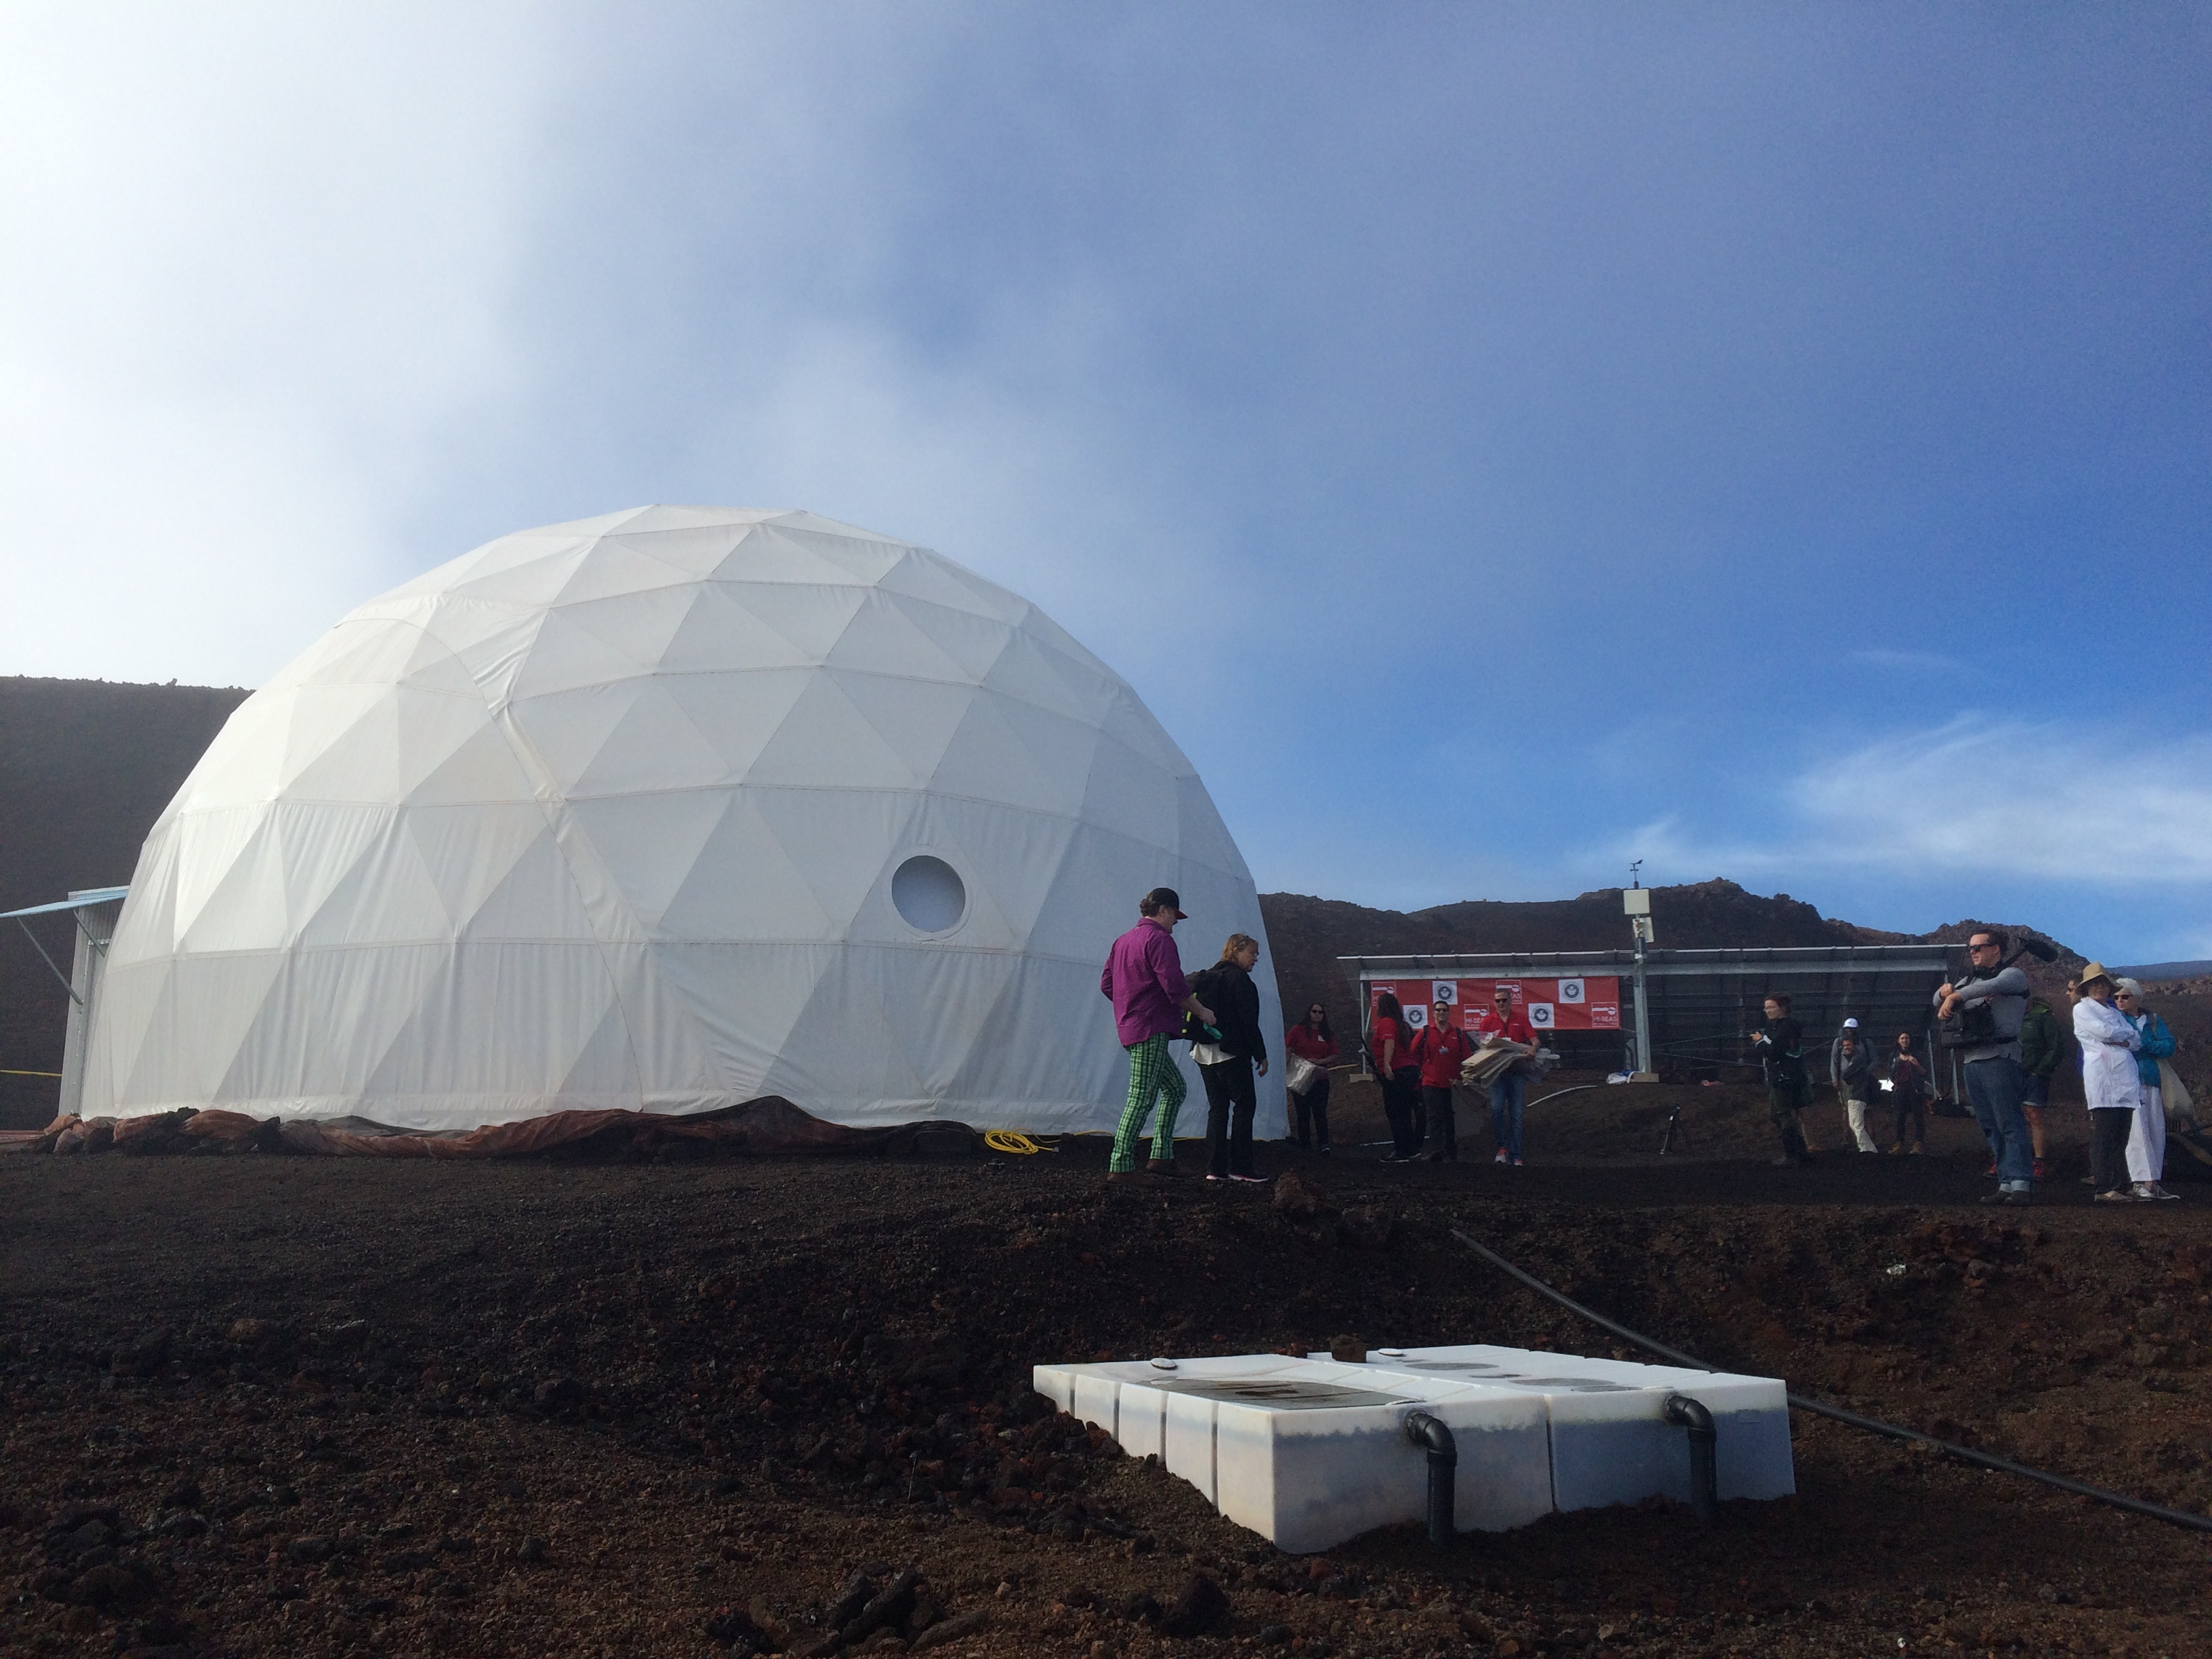 One-Year Mock Mars Crew 'Returns to Earth': HI-SEAS Photos